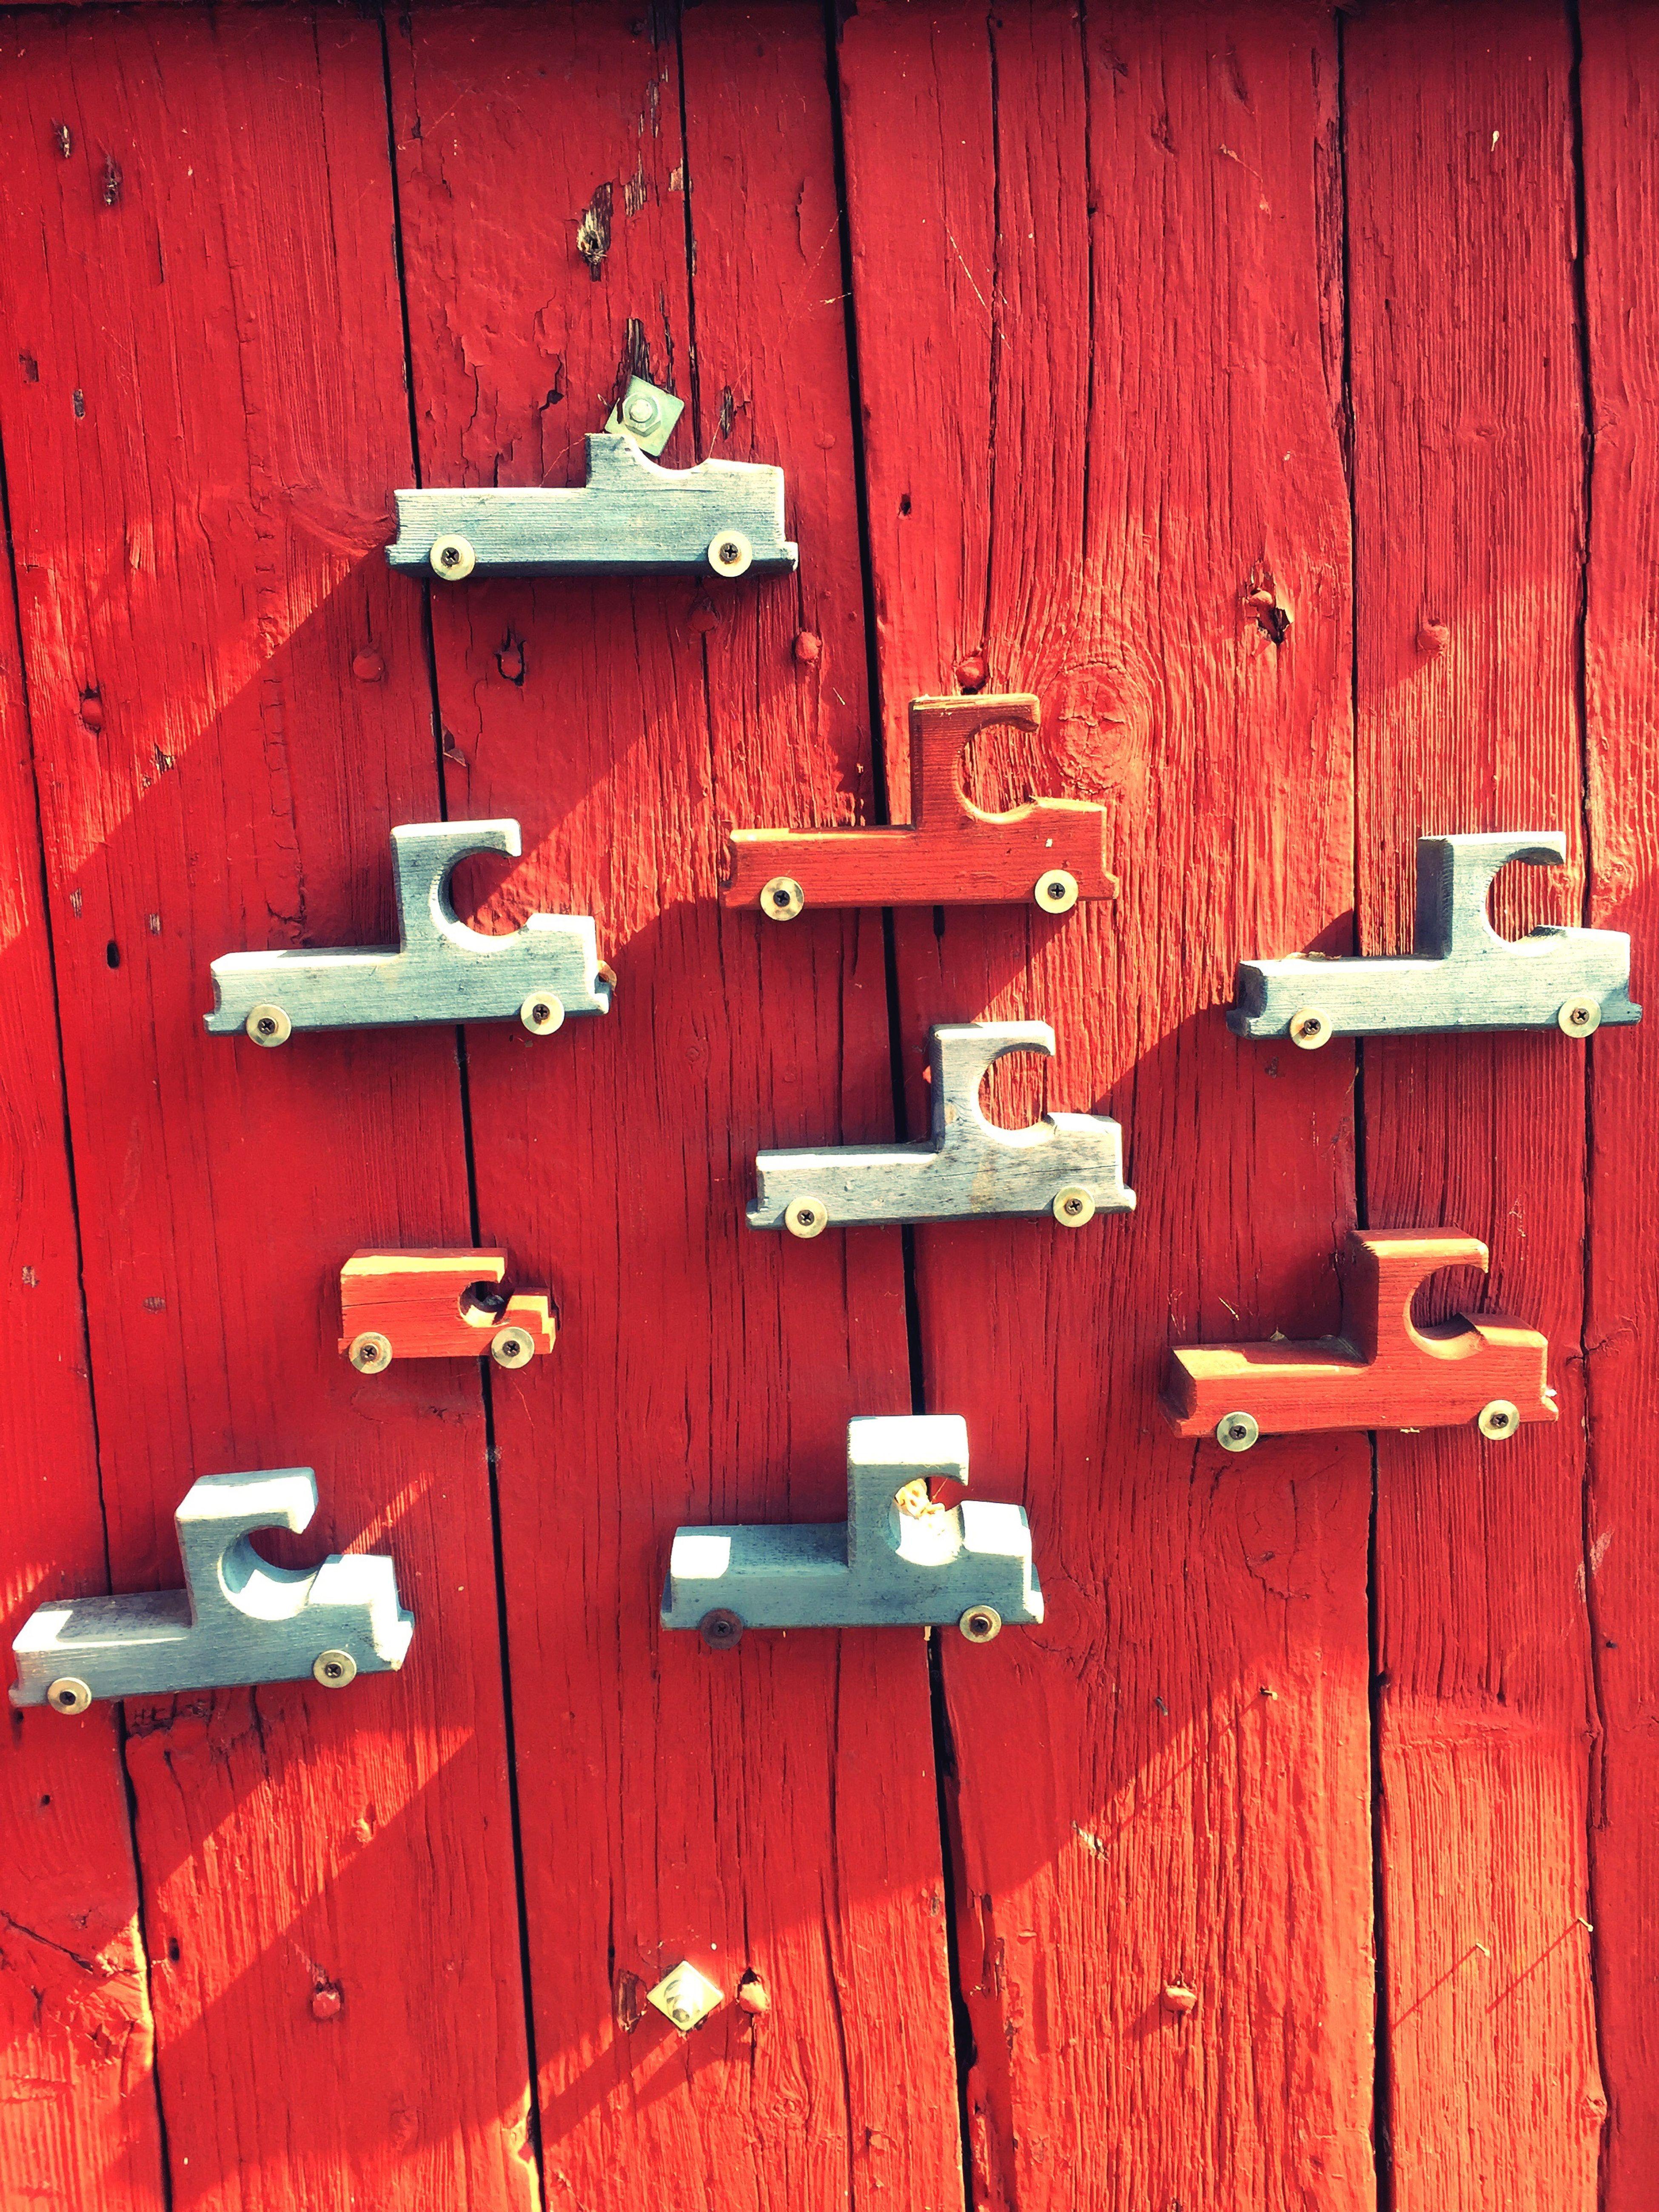 Beautifully Organized Wooden Cars Outdoors Wall Red Wall Finland Tammisaari Summer